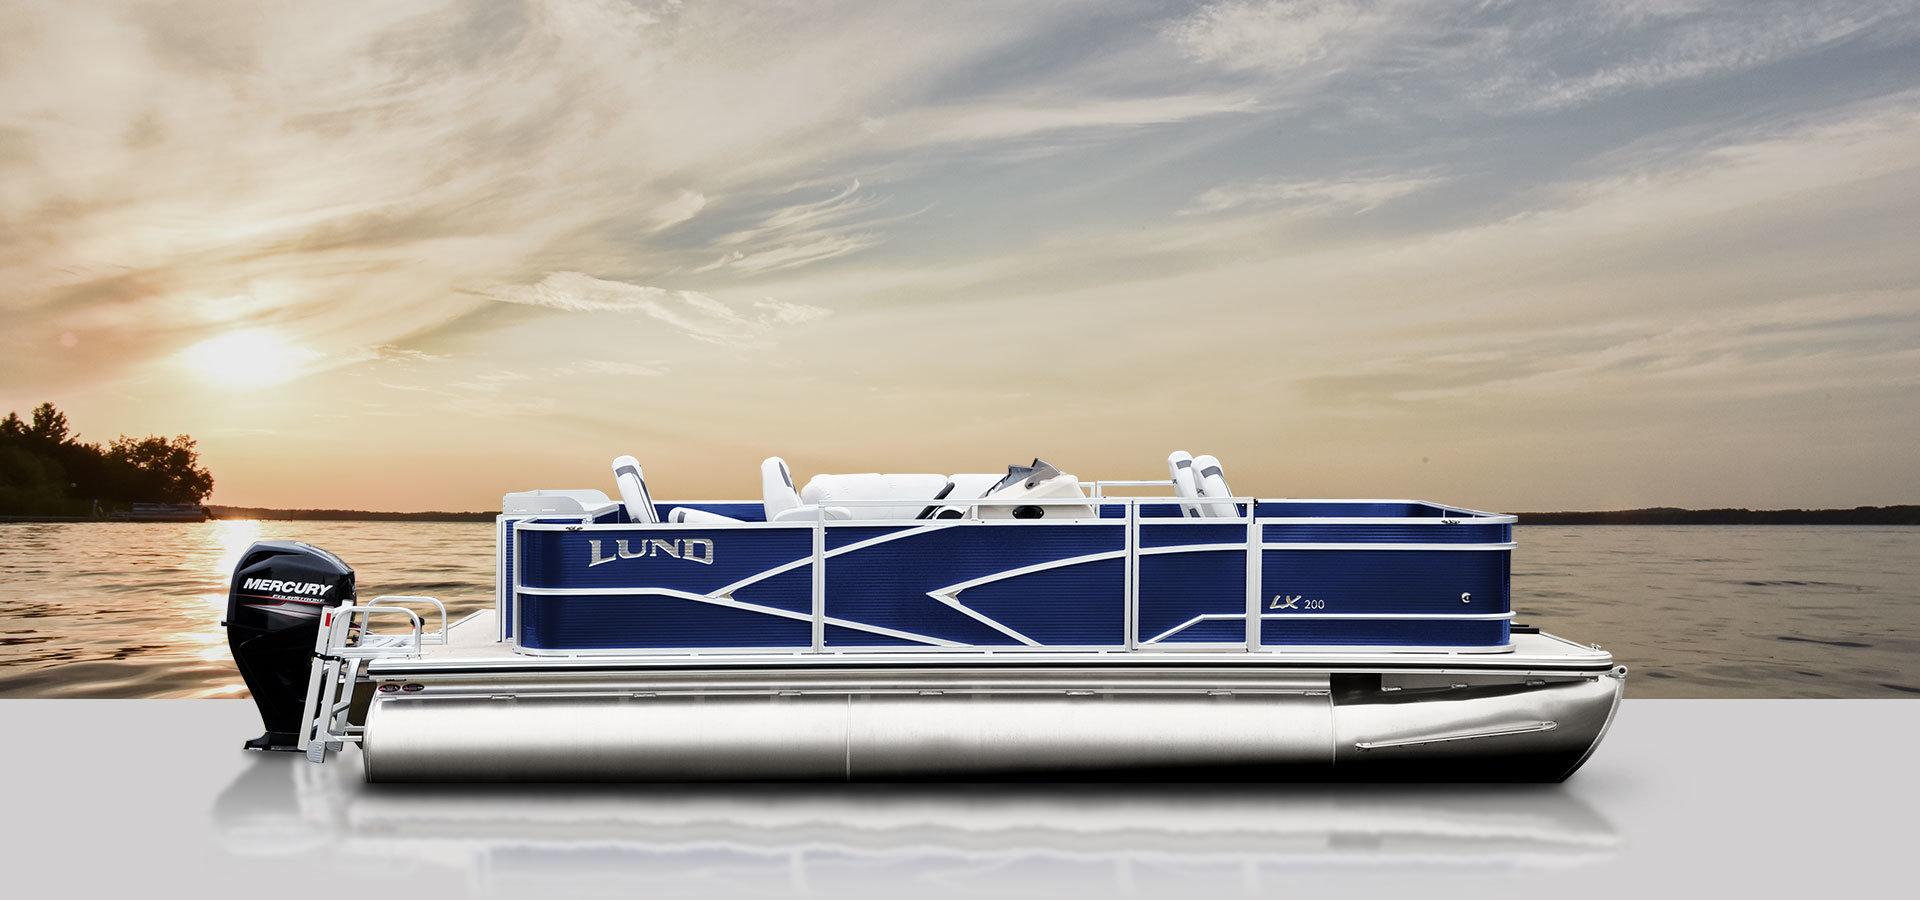 Lund LX200 Fishing Pontoon Boat 00268